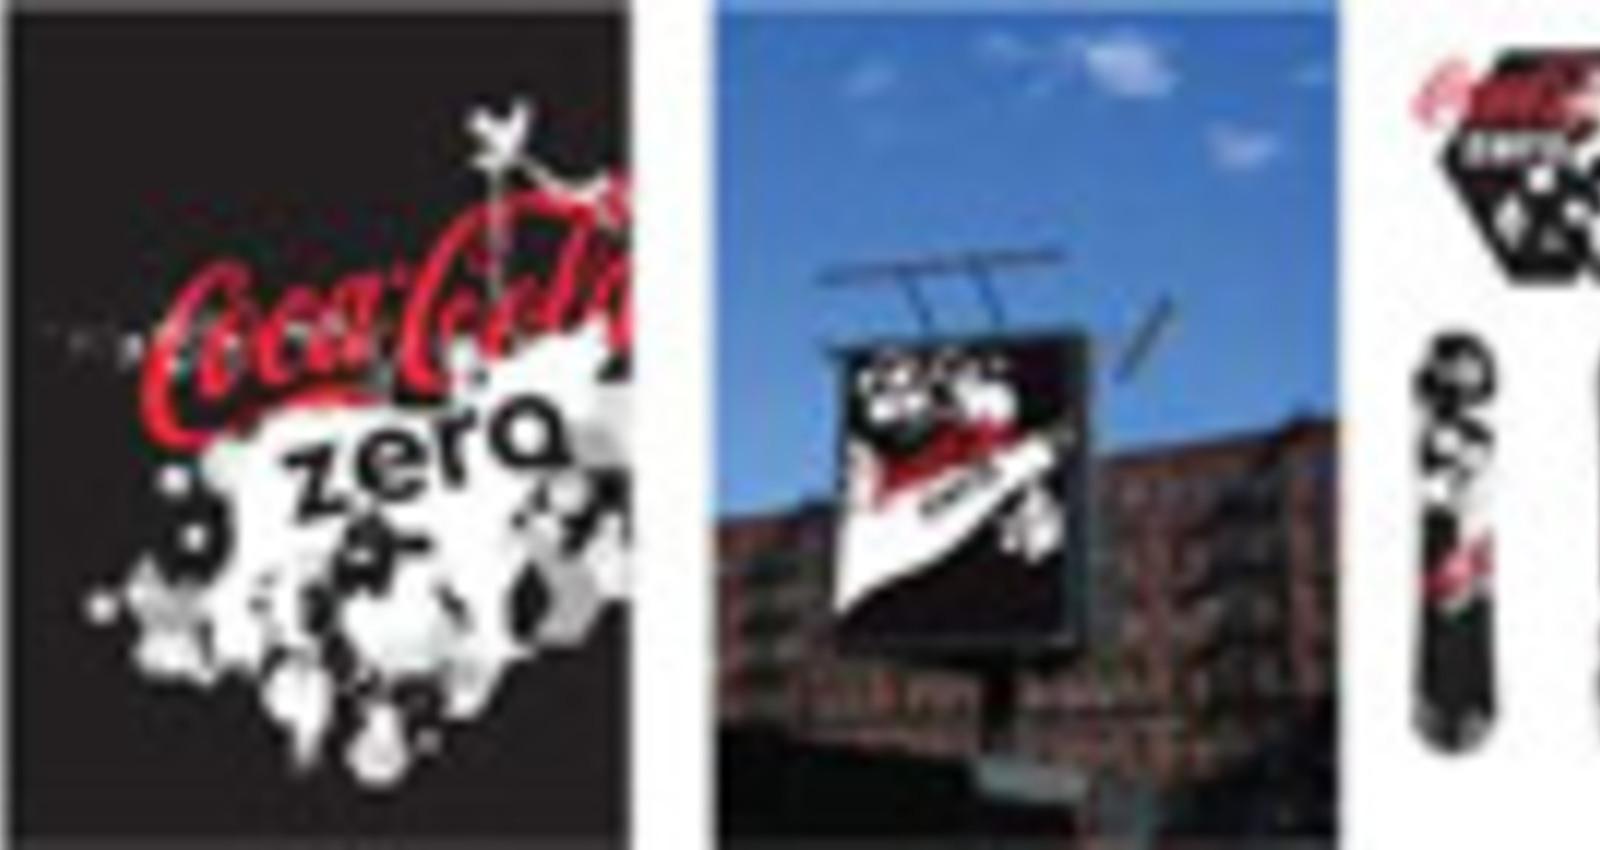 Coca-Cola Zero Brand Identity and Visual Language